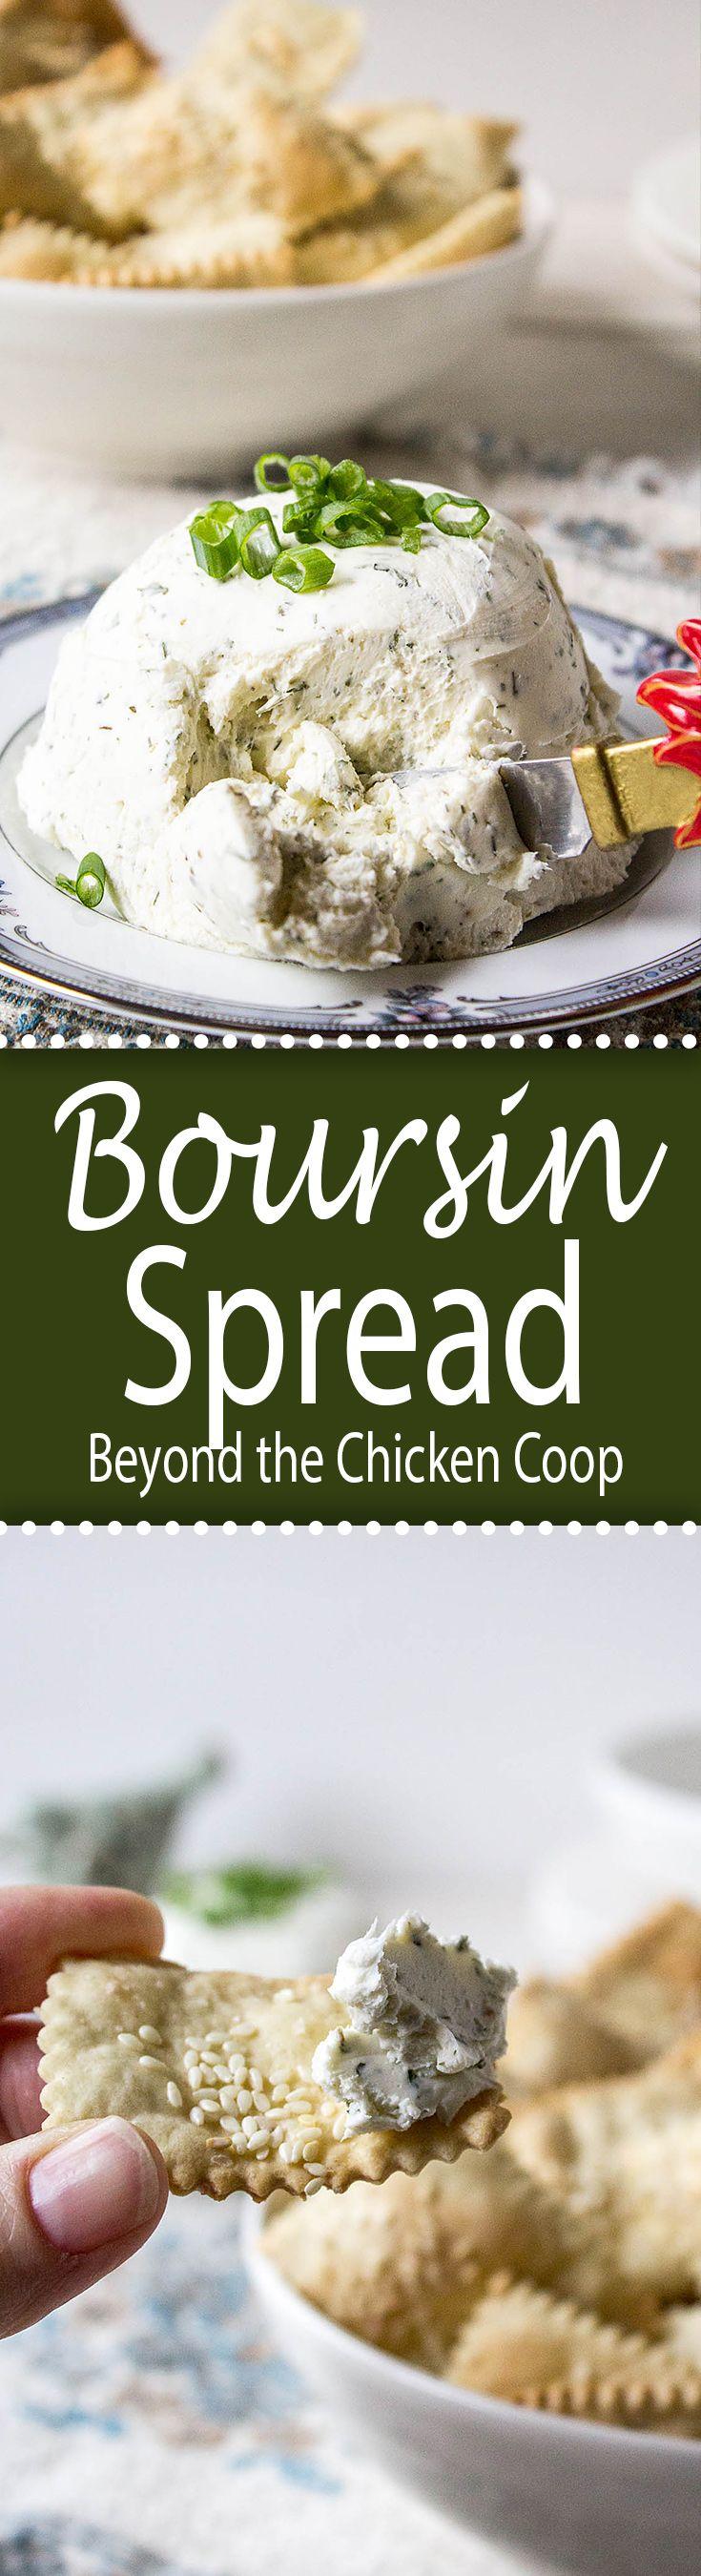 Homemade Boursin Cheese Spread